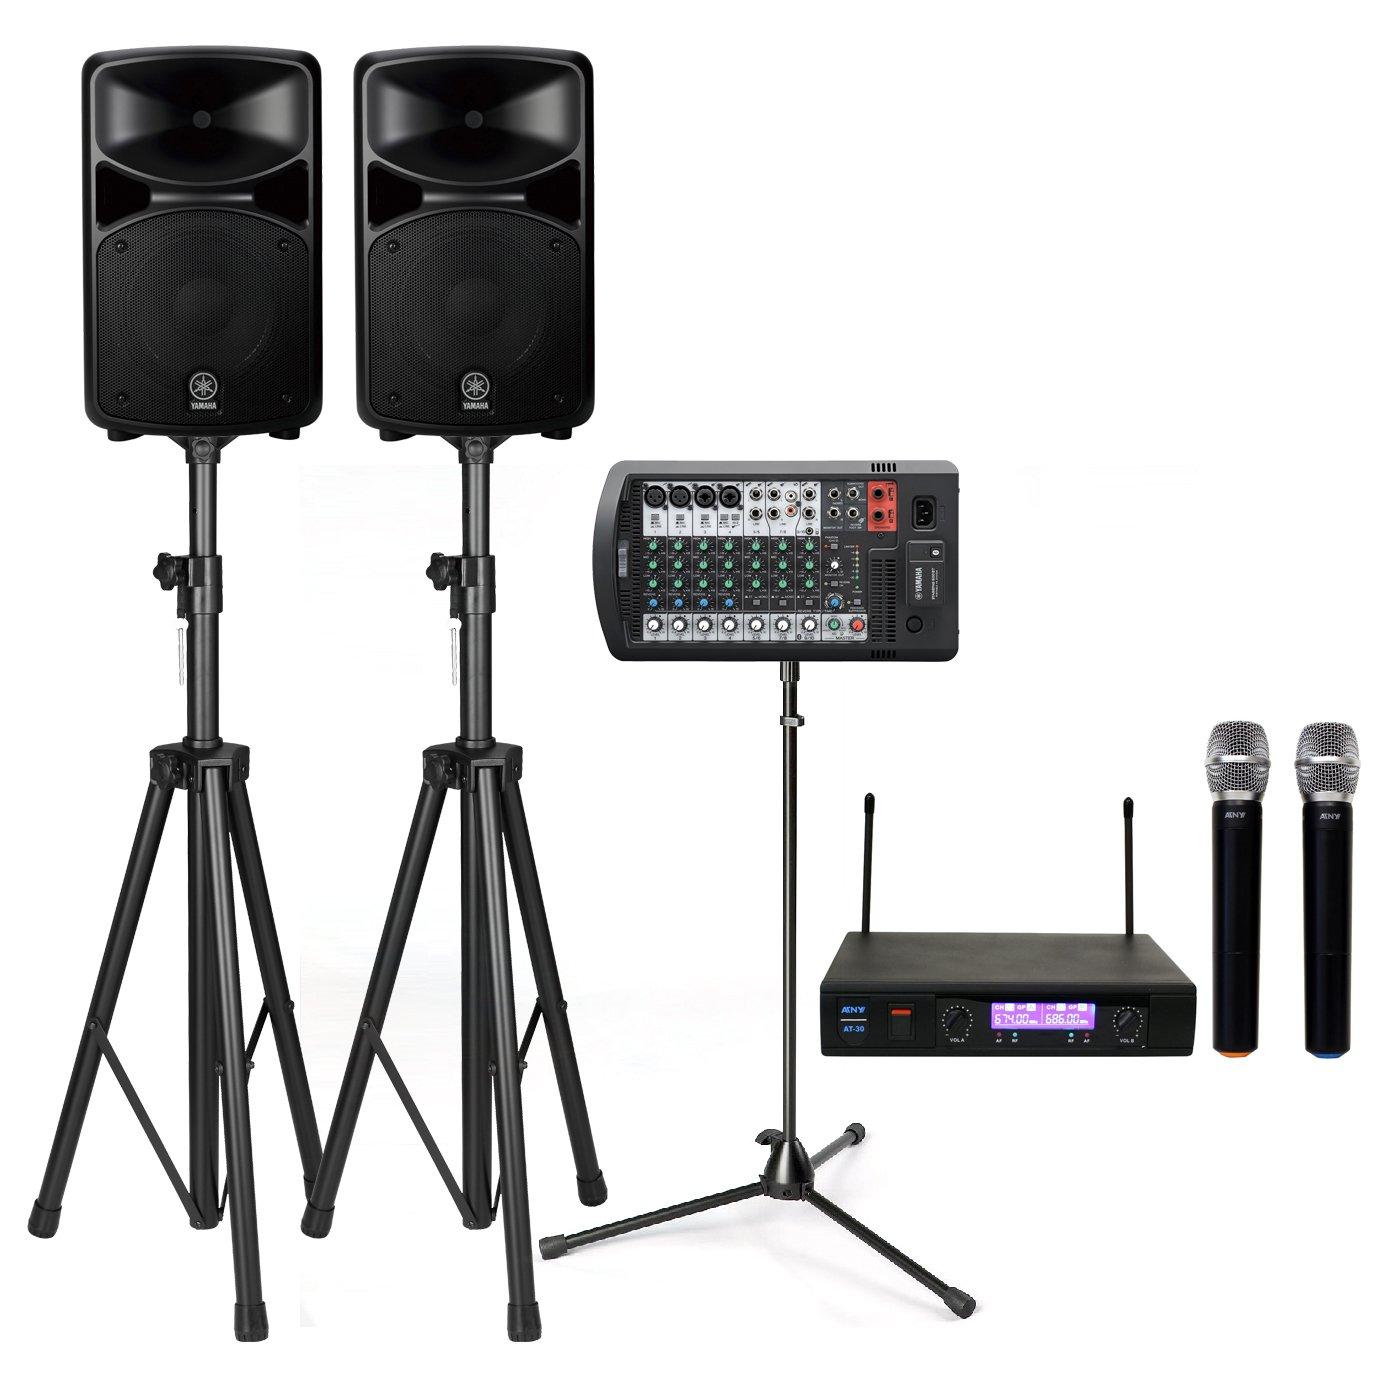 Yamaha STAGEPAS 600BT Stereo Powered Mixer